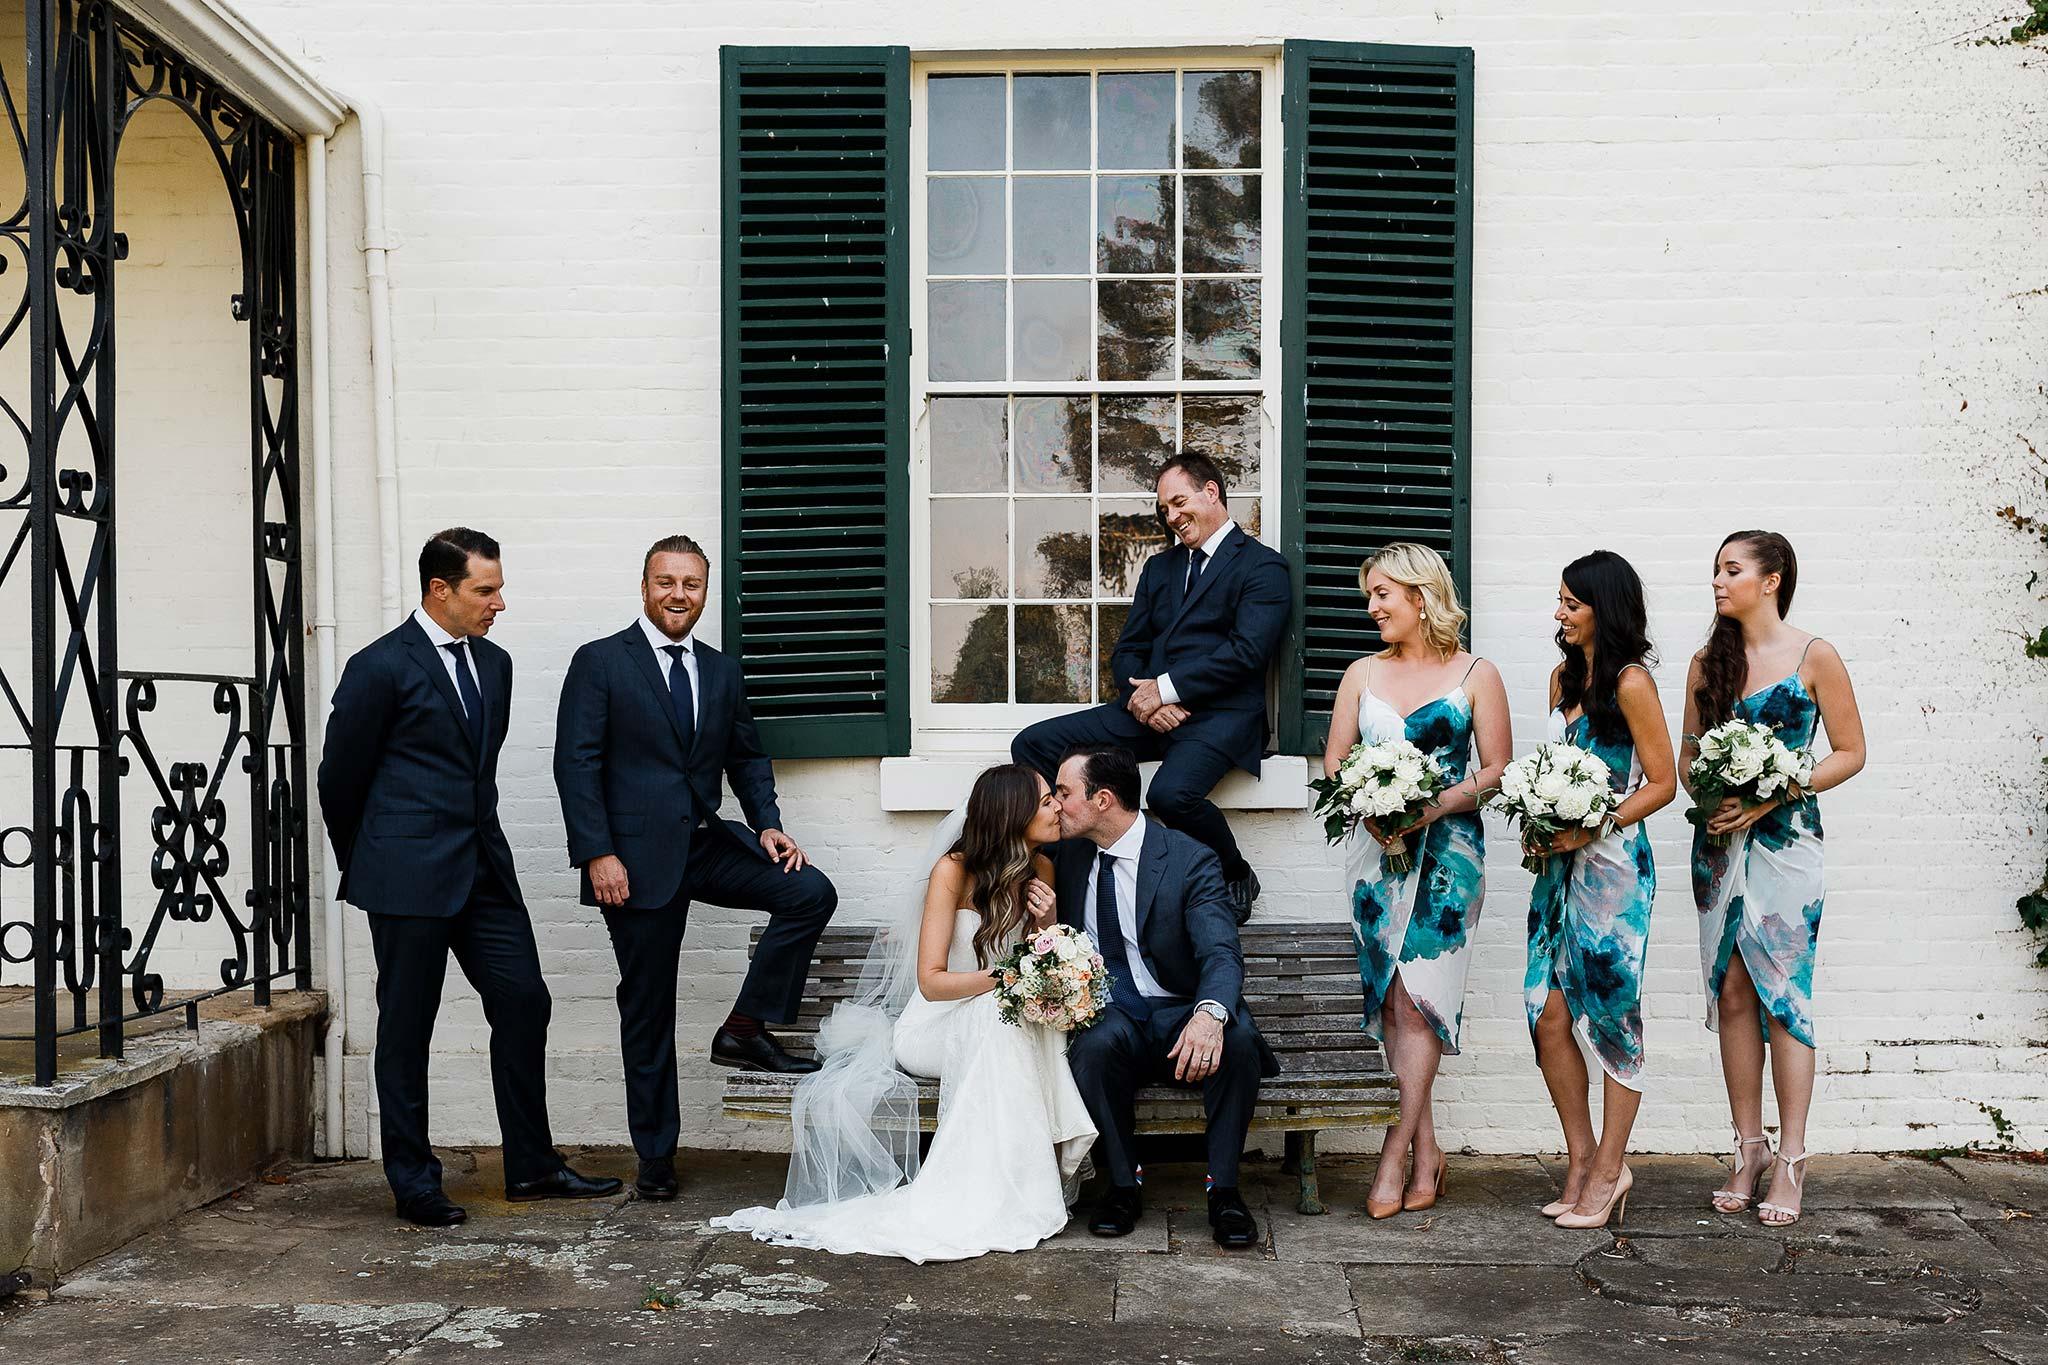 Launceston-Brickendon-Wedding-Photographer-bridal-party